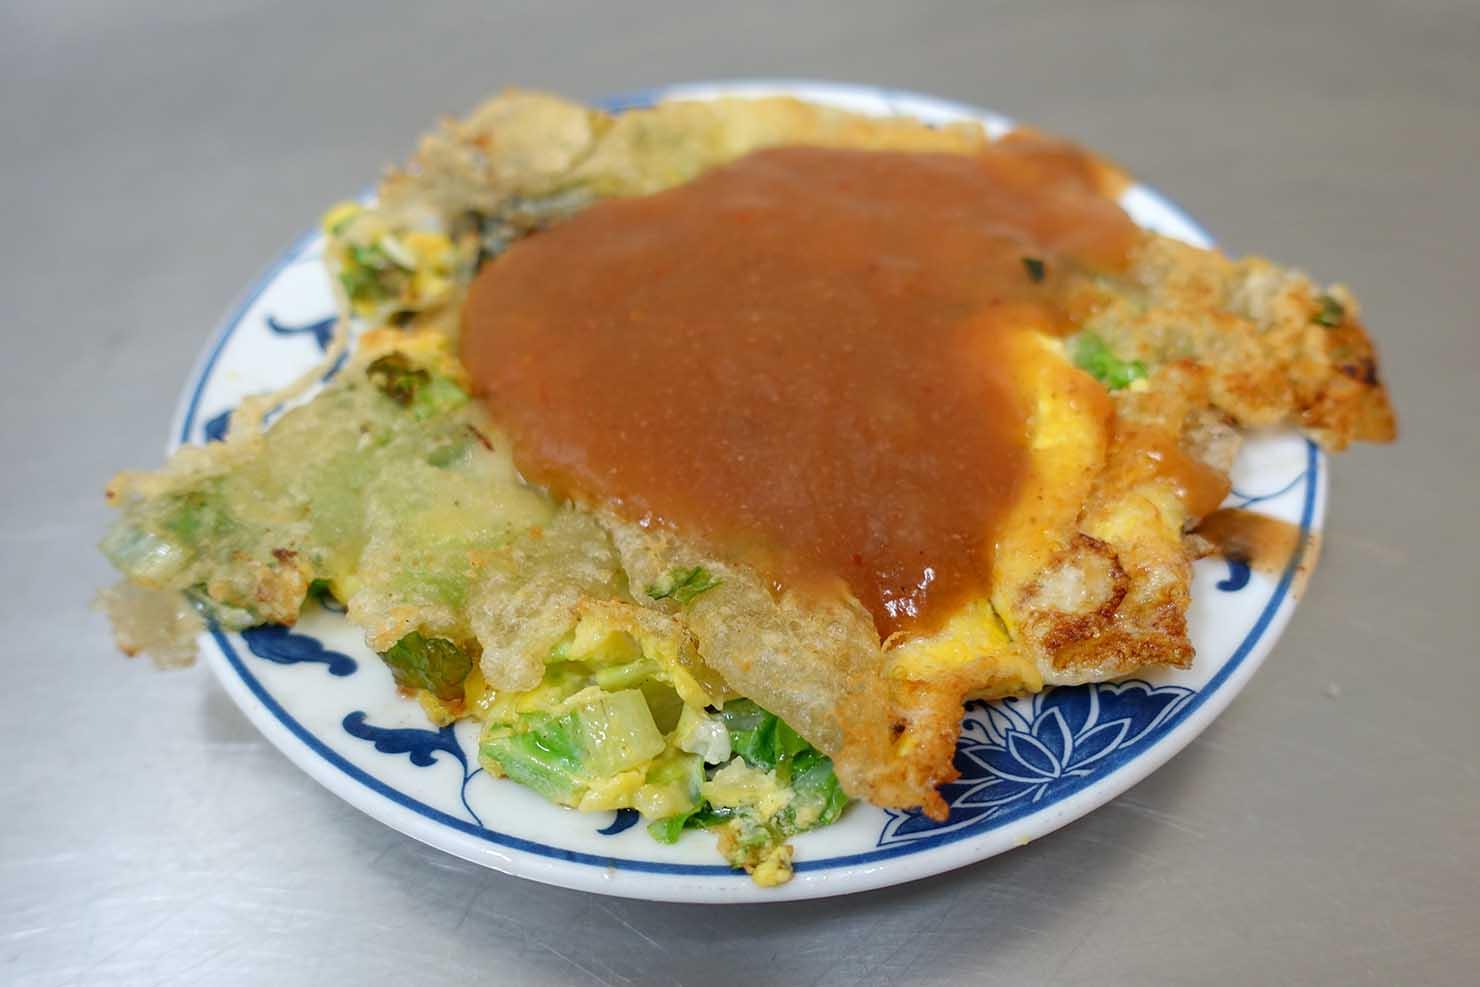 台北駅最寄りの人気夜市・寧夏夜市「賴雞蛋蚵仔煎」の雞蛋蚵仔煎(牡蠣オムレツ)